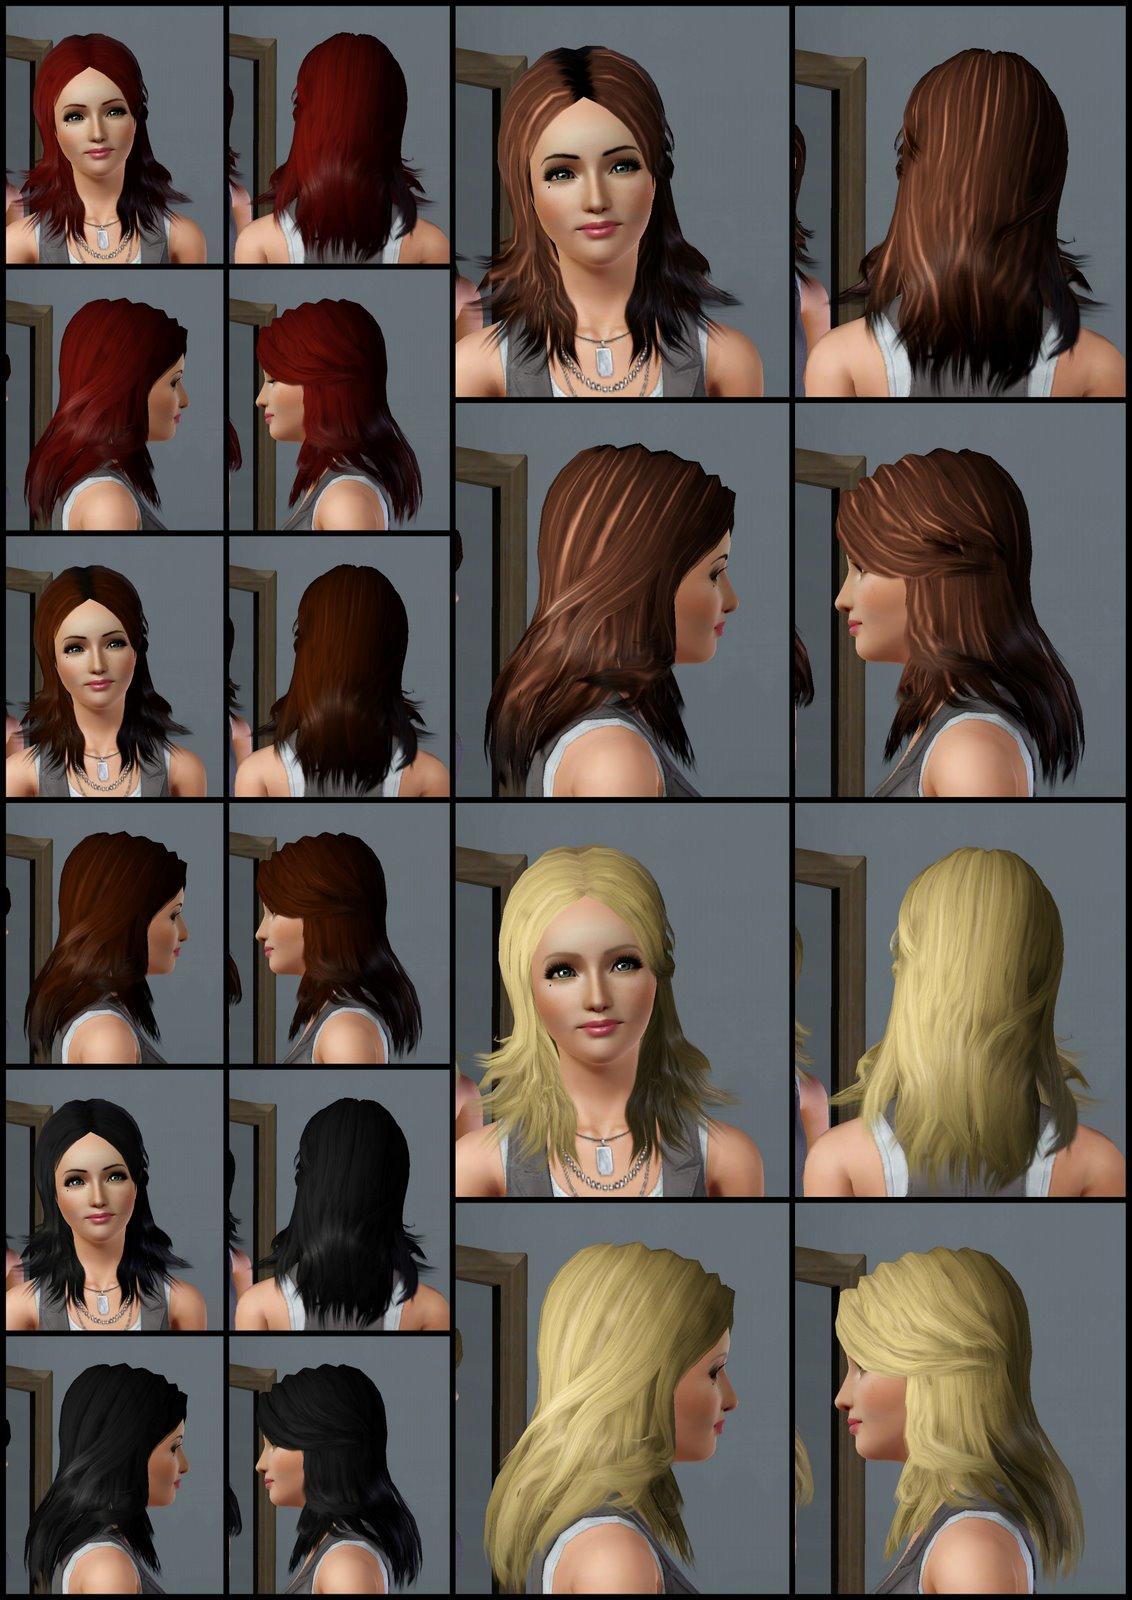 The Sims 3 Store: Hair Showroom: Long Wavy Hair